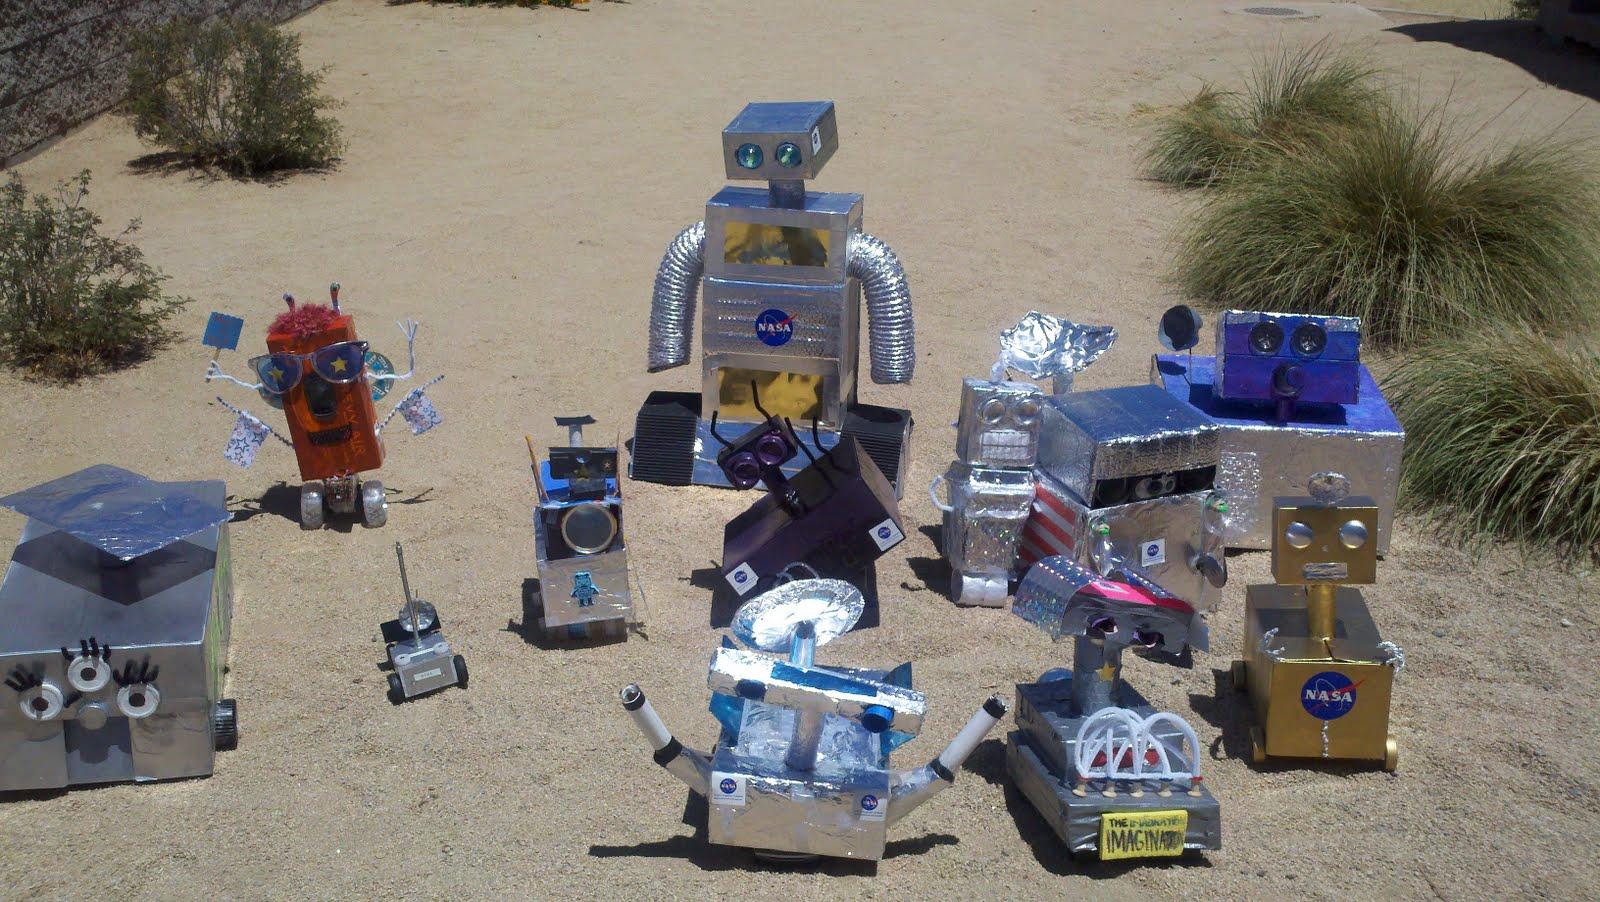 mars rover school project - photo #23